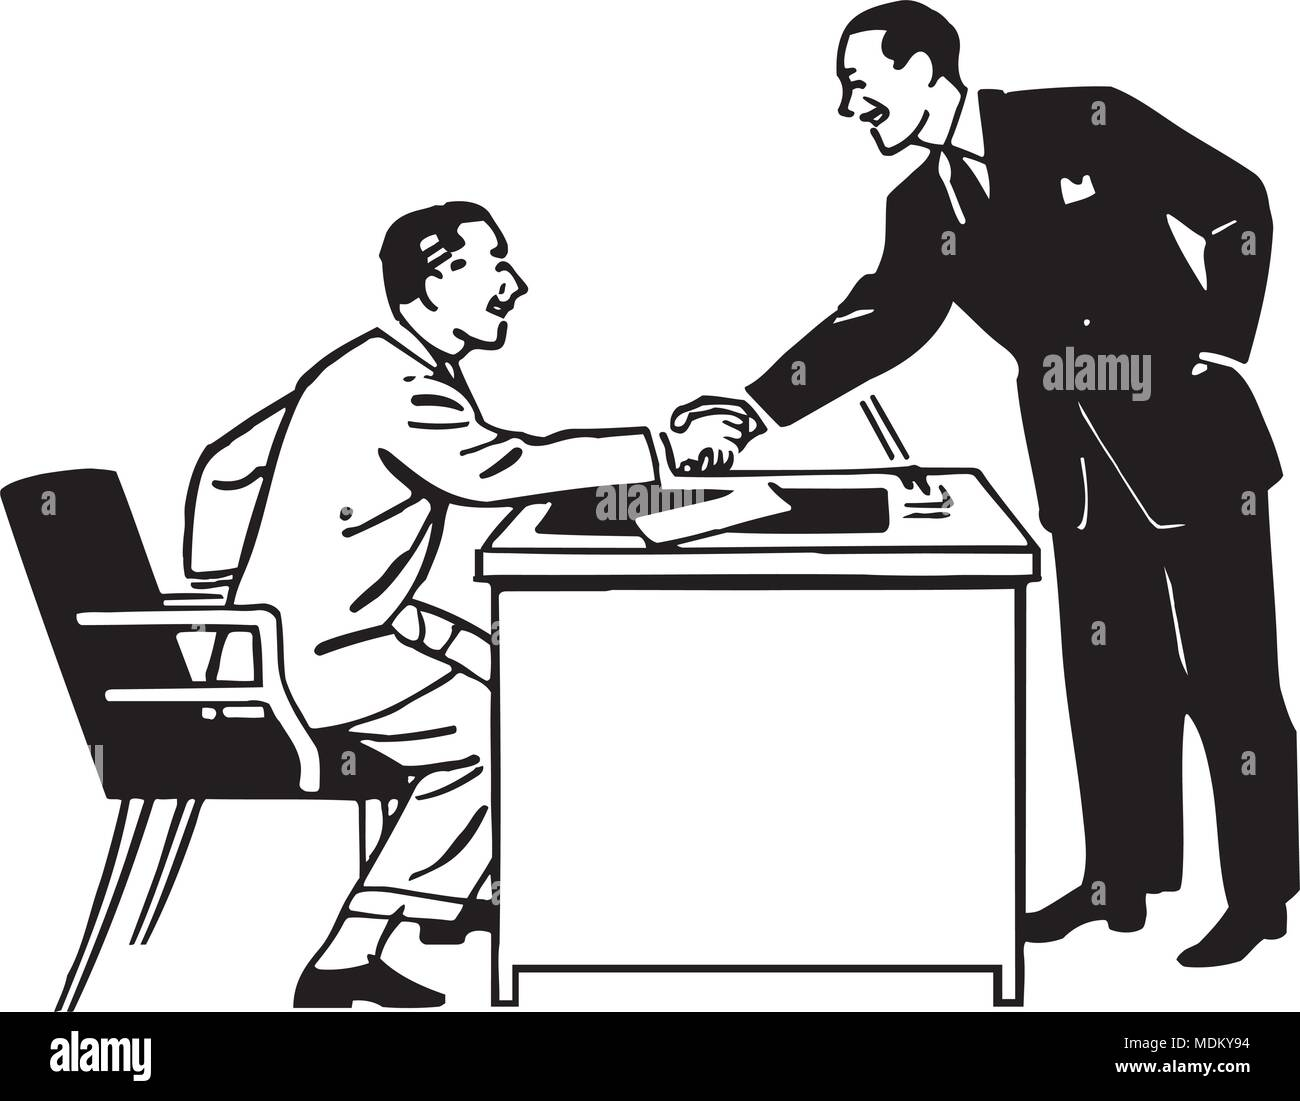 Business Transaction - Retro Clipart Illustration - Stock Image